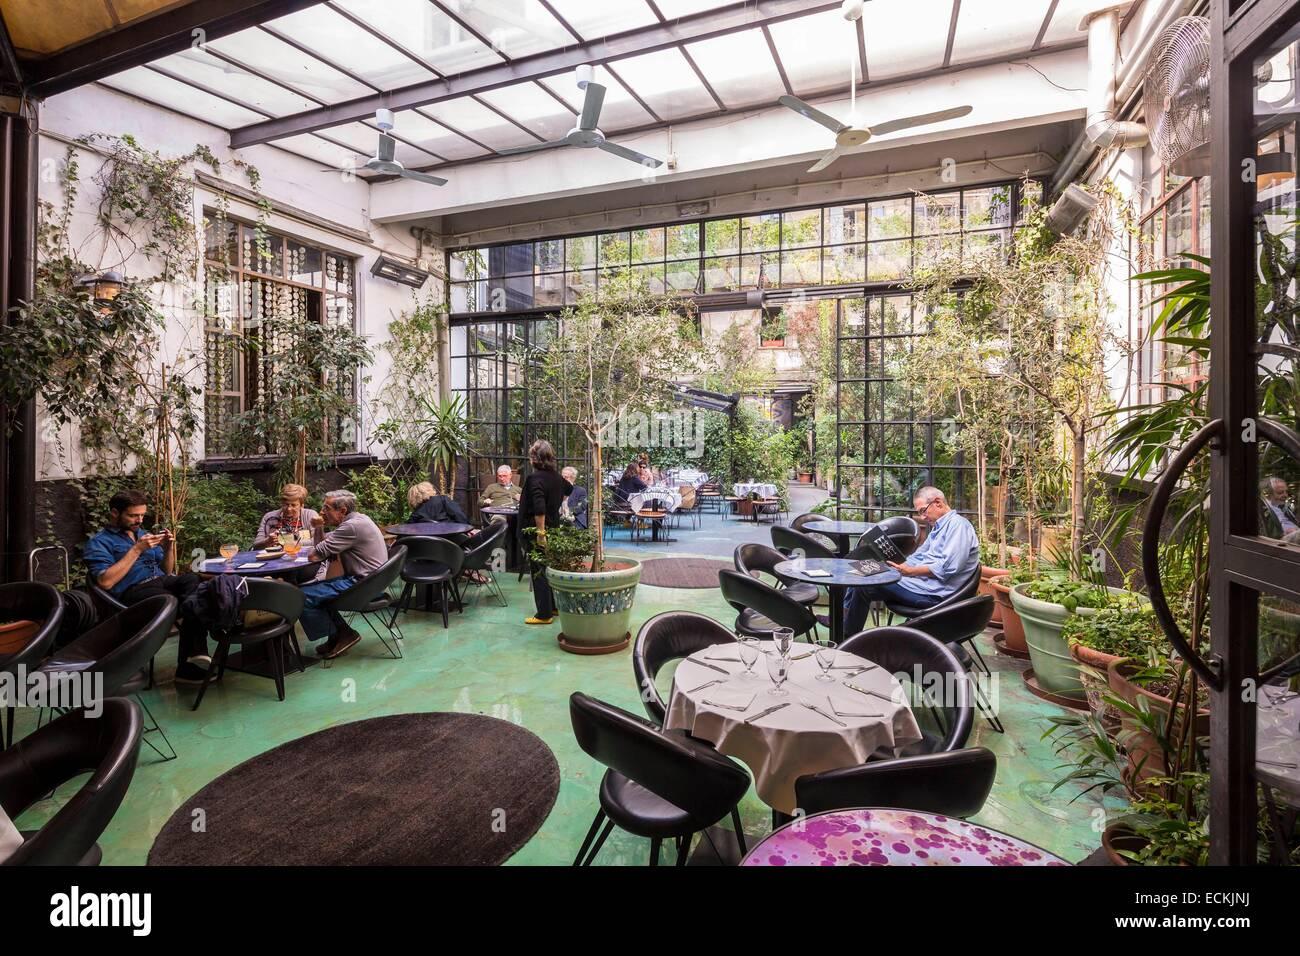 italien lombardei mailand 10 corso como cafe restaurant hotel corso como stockfoto bild. Black Bedroom Furniture Sets. Home Design Ideas